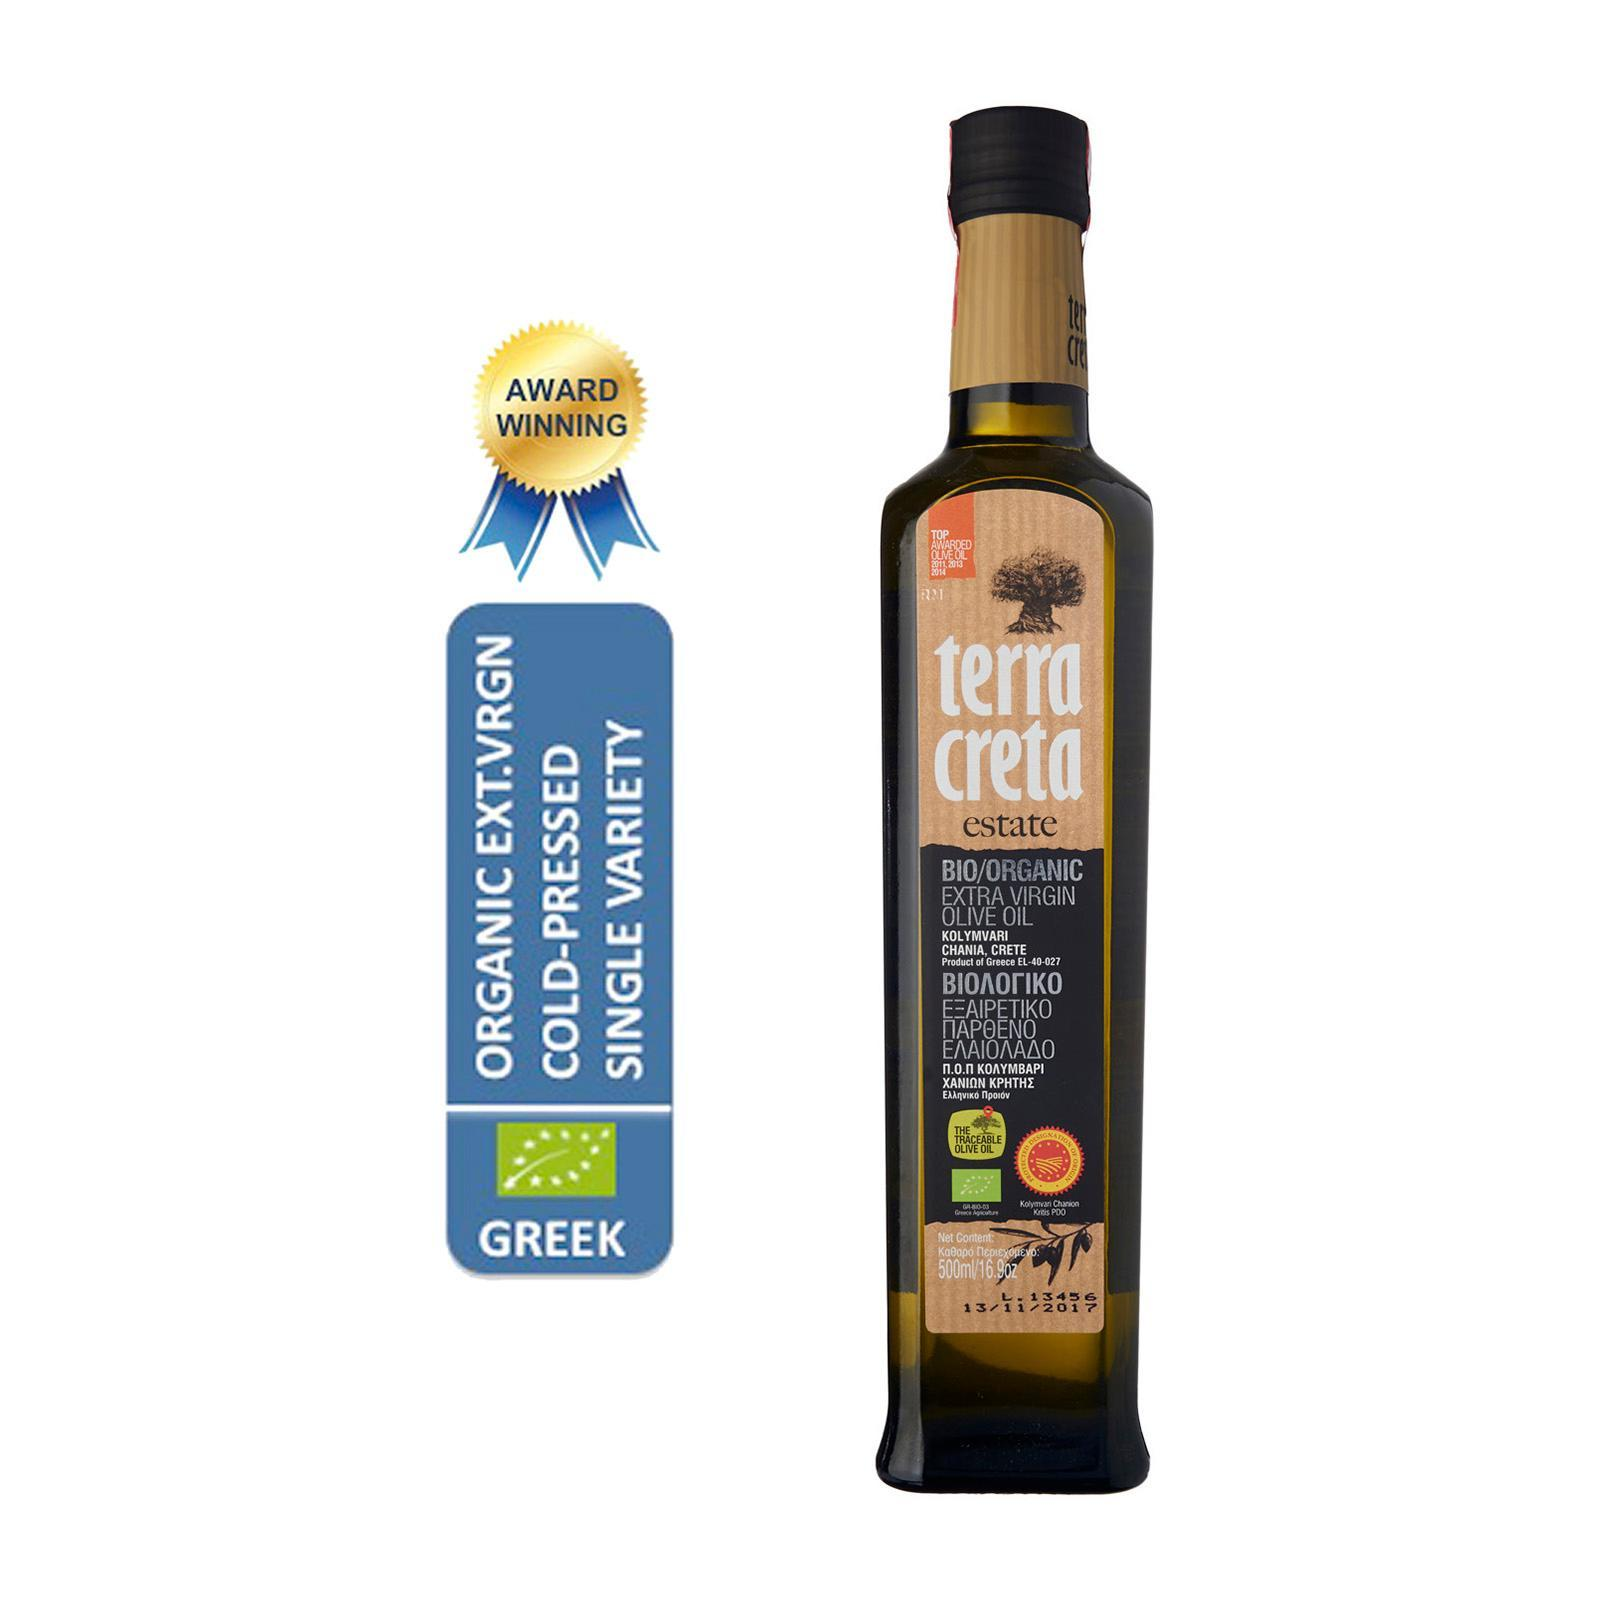 Terra Creta Estate Greek Organic Extra Virgin Olive Oil (Crete) - By Agora Products